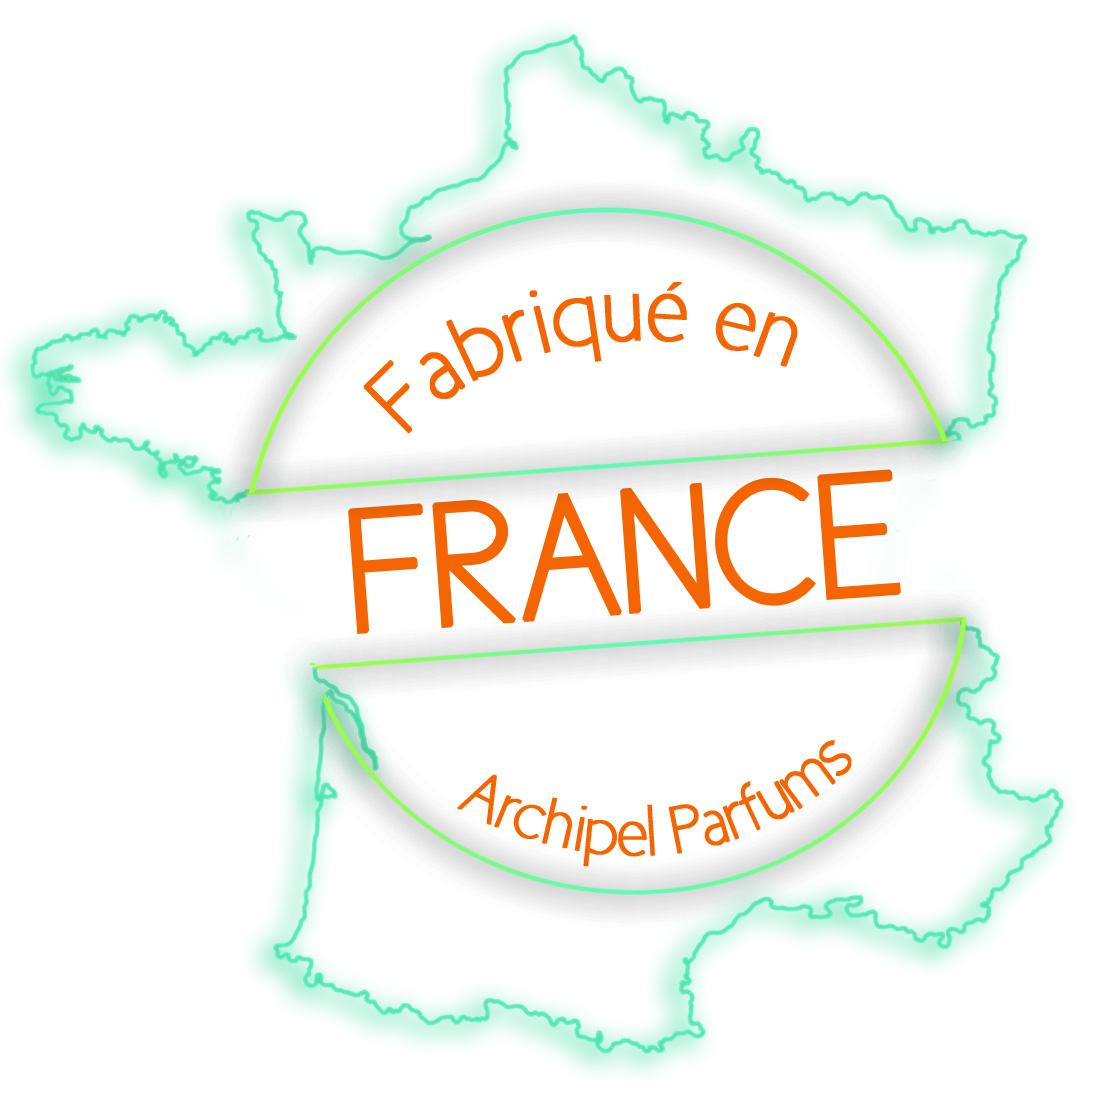 Fondants parfumés Fabriqués en France artisanalement